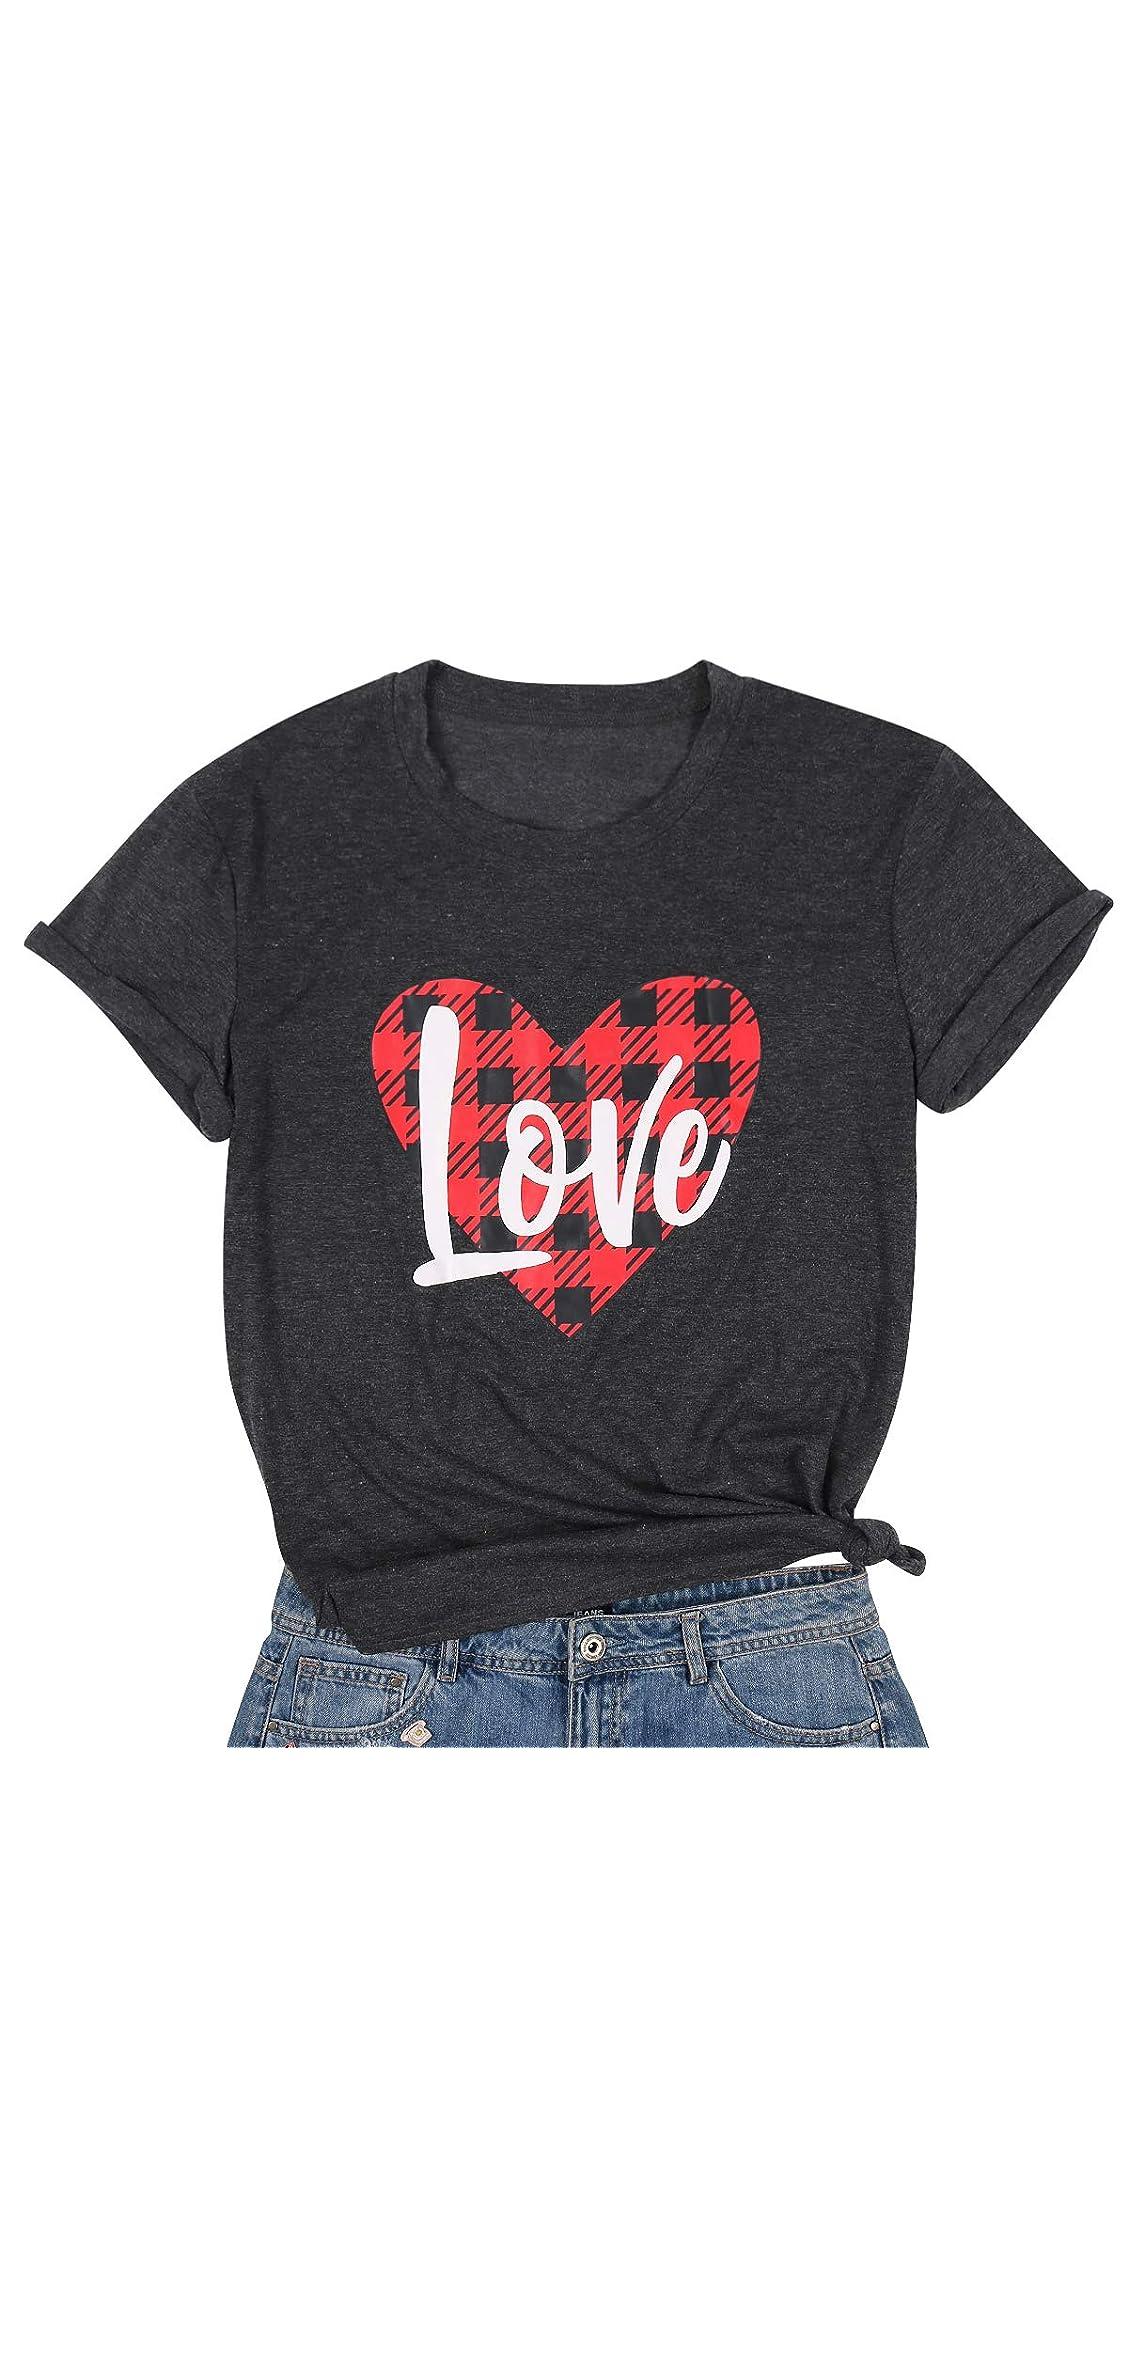 Valentine's Day Shirt Women's Cute Heart-shaped Plaid Tee